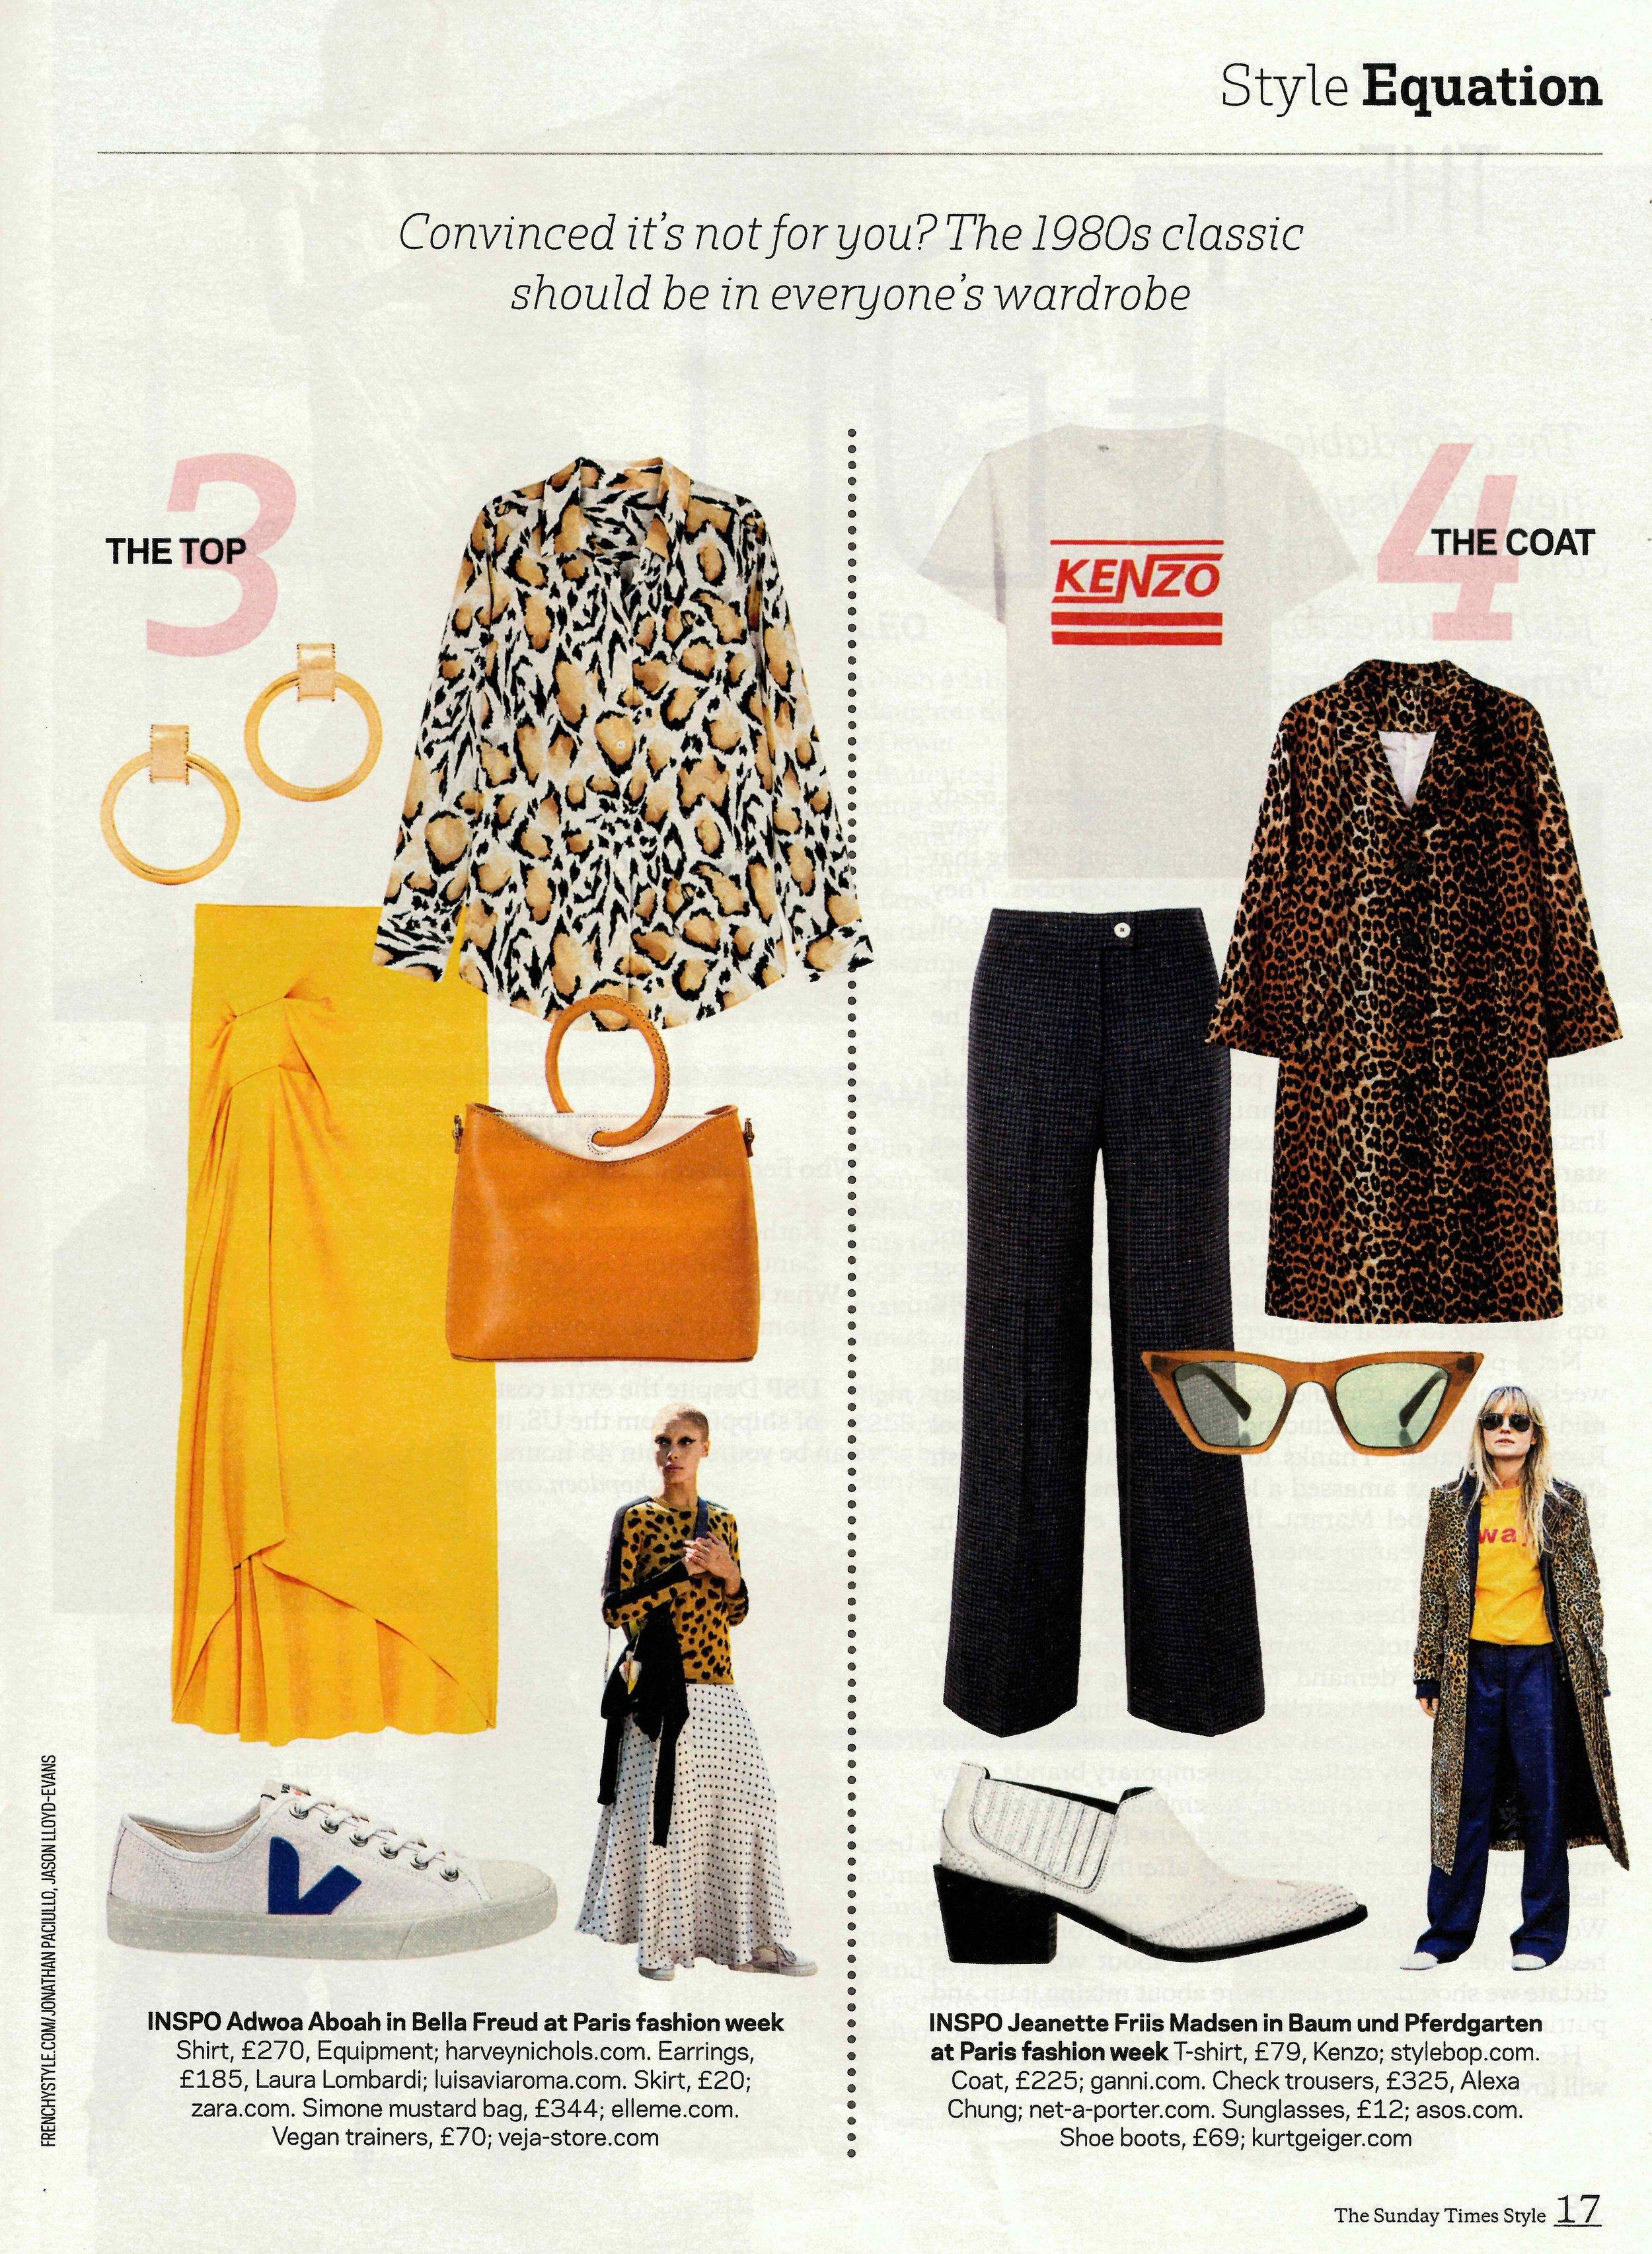 08.04.18 Sunday Times Style - 1.jpg